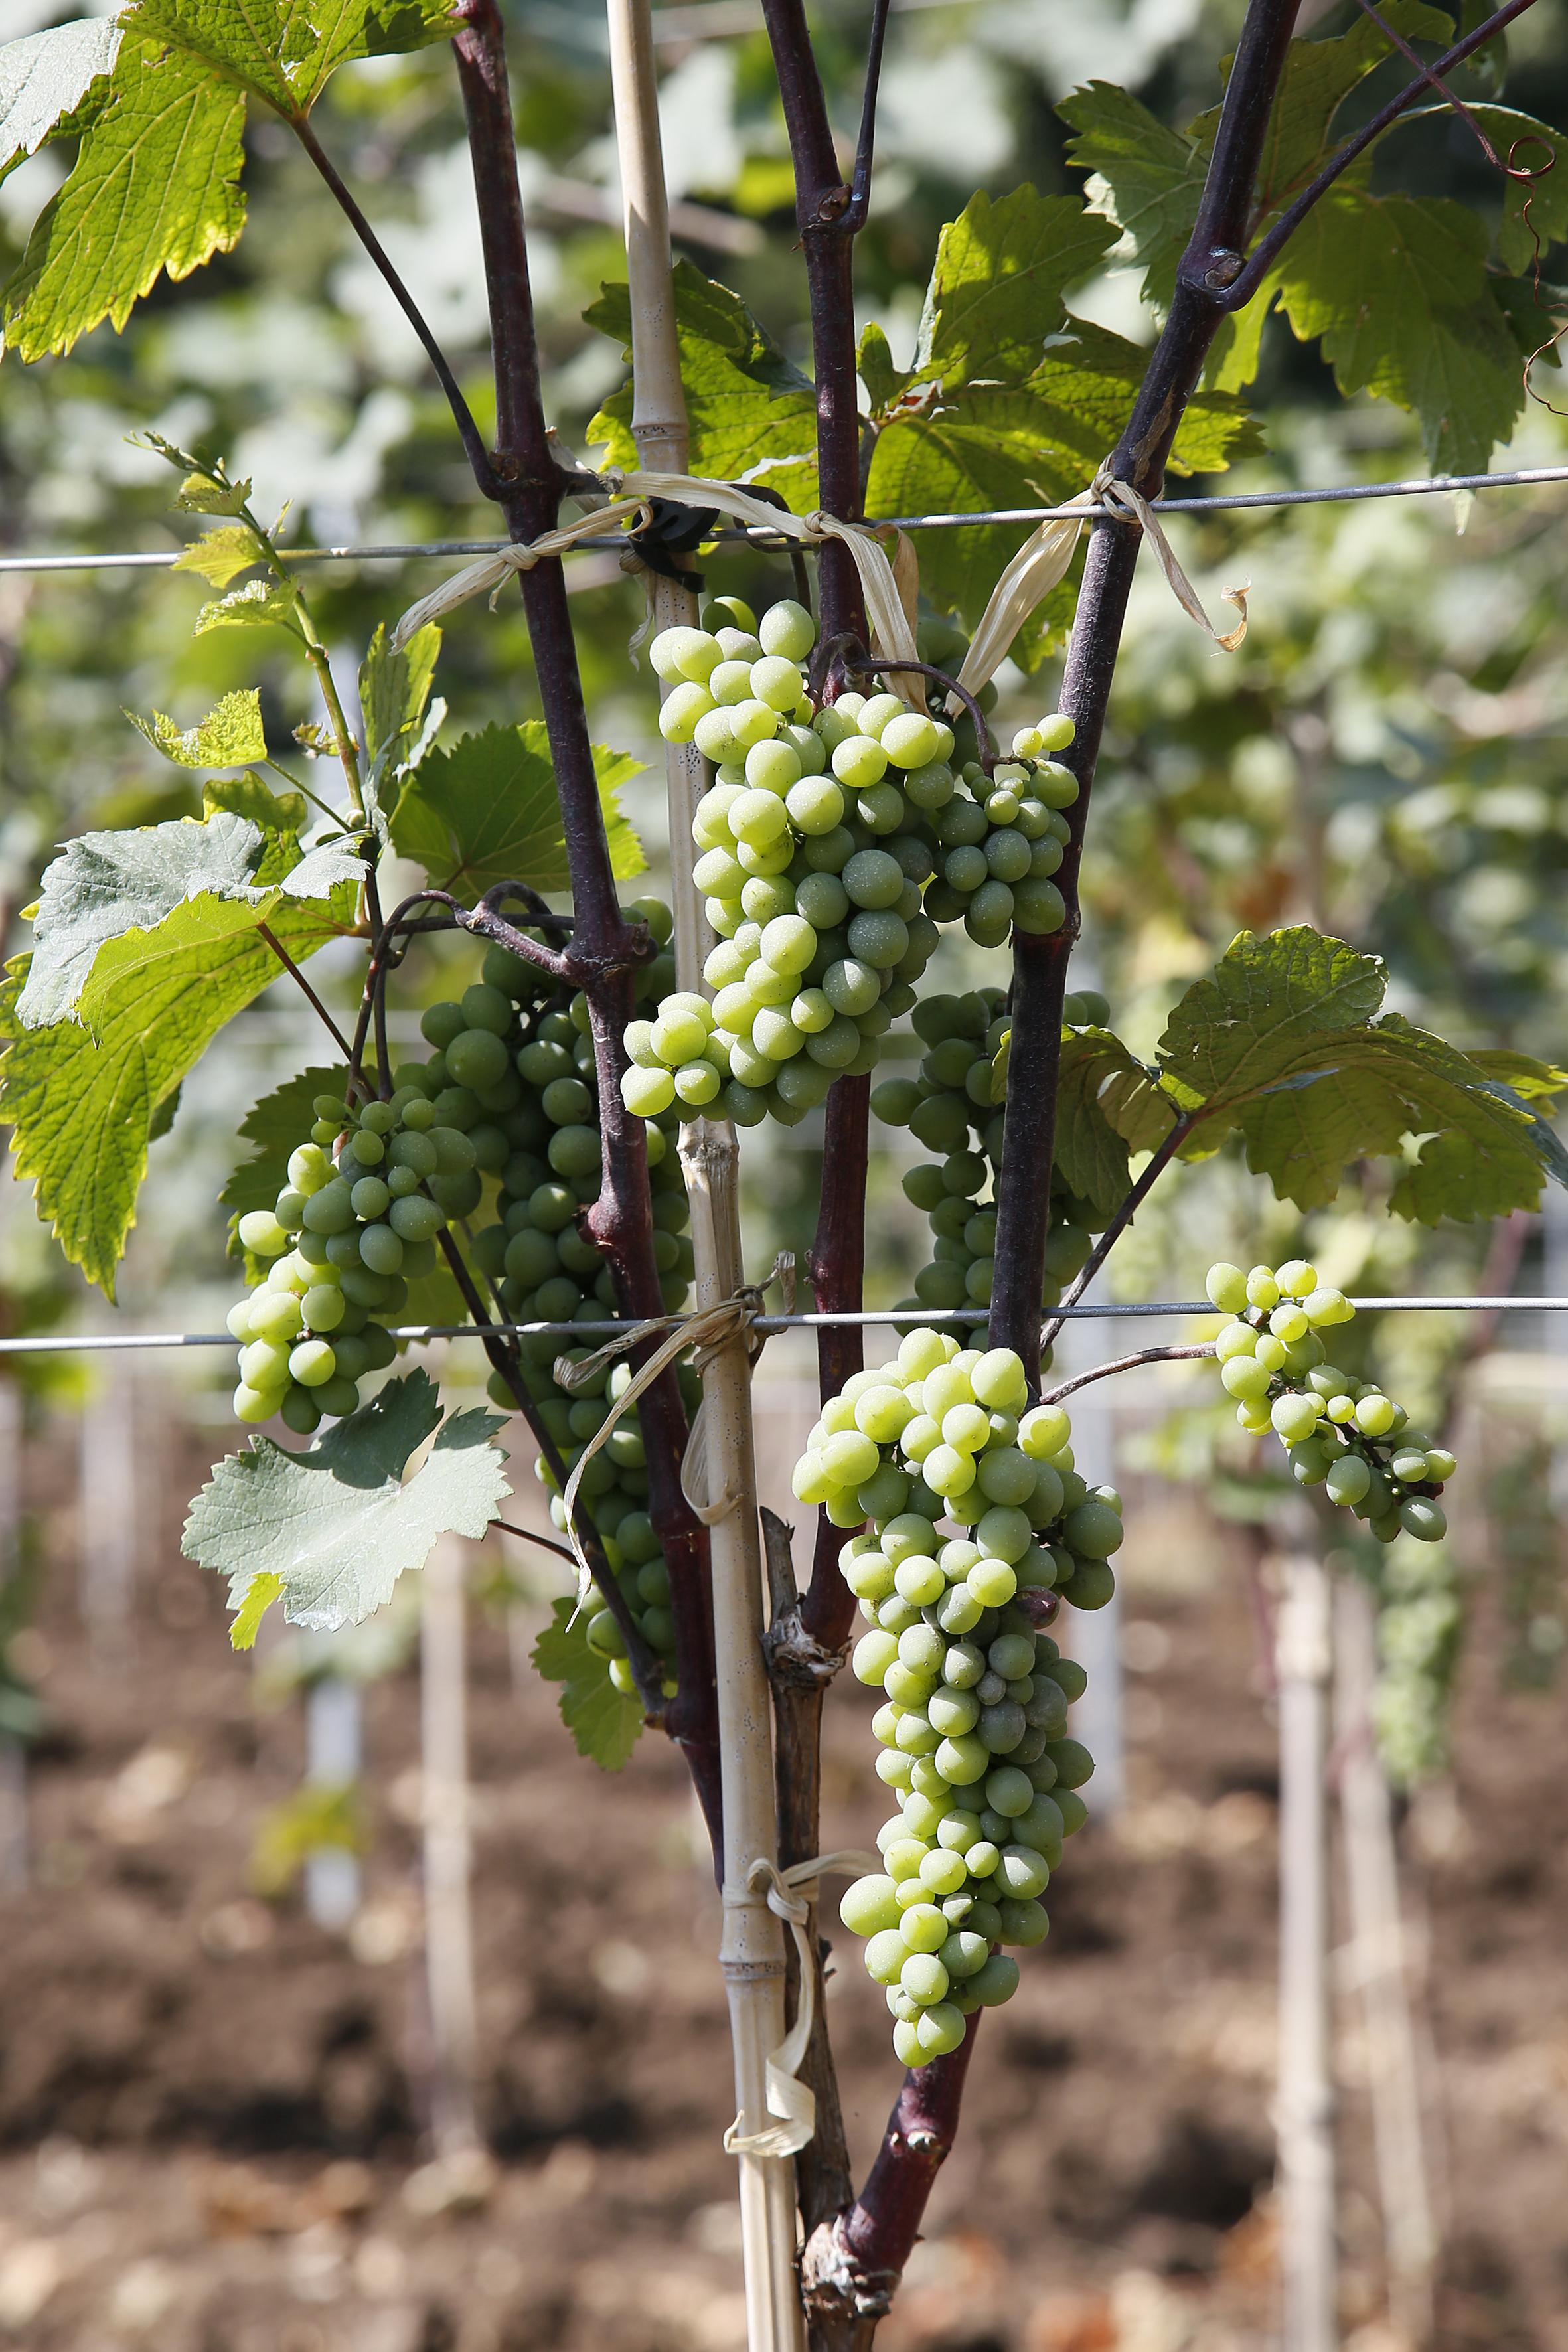 Close up of a Georgian grape variety Khikhvi. Used for orange or amber wine